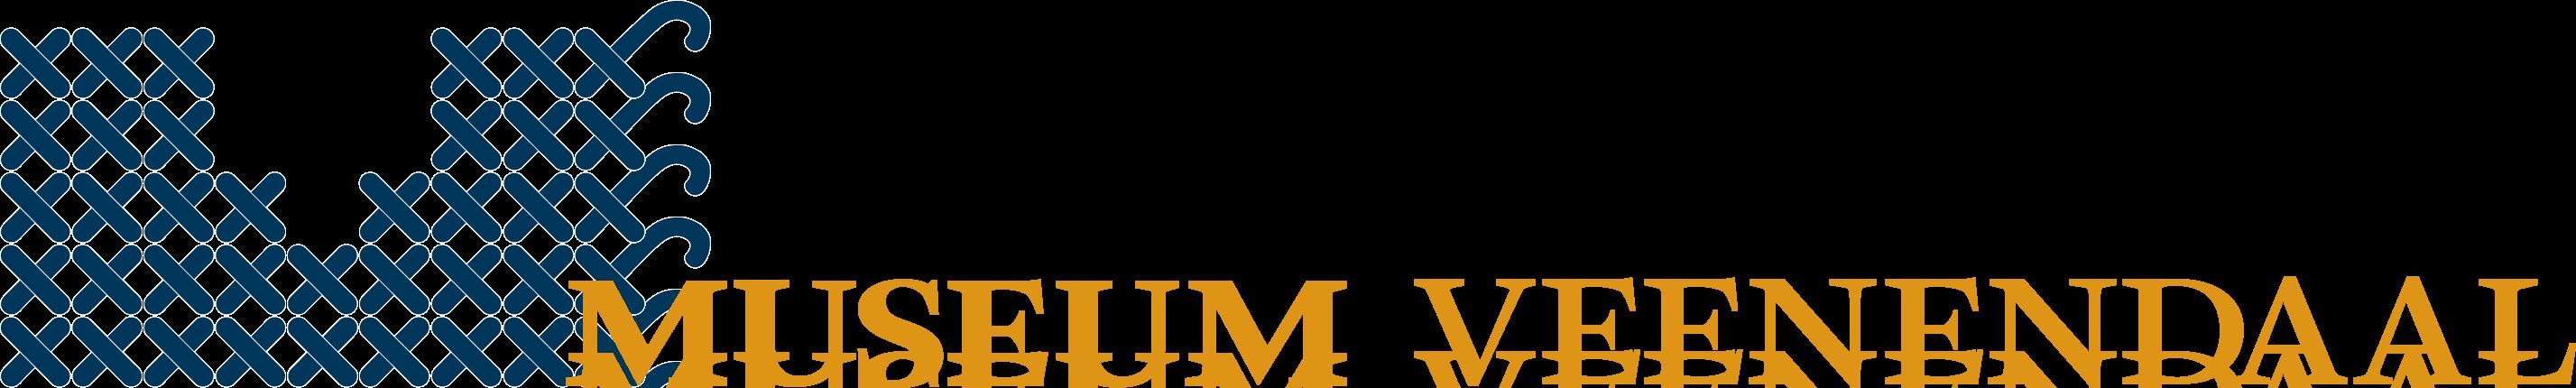 Stichting Museum Veenendaal